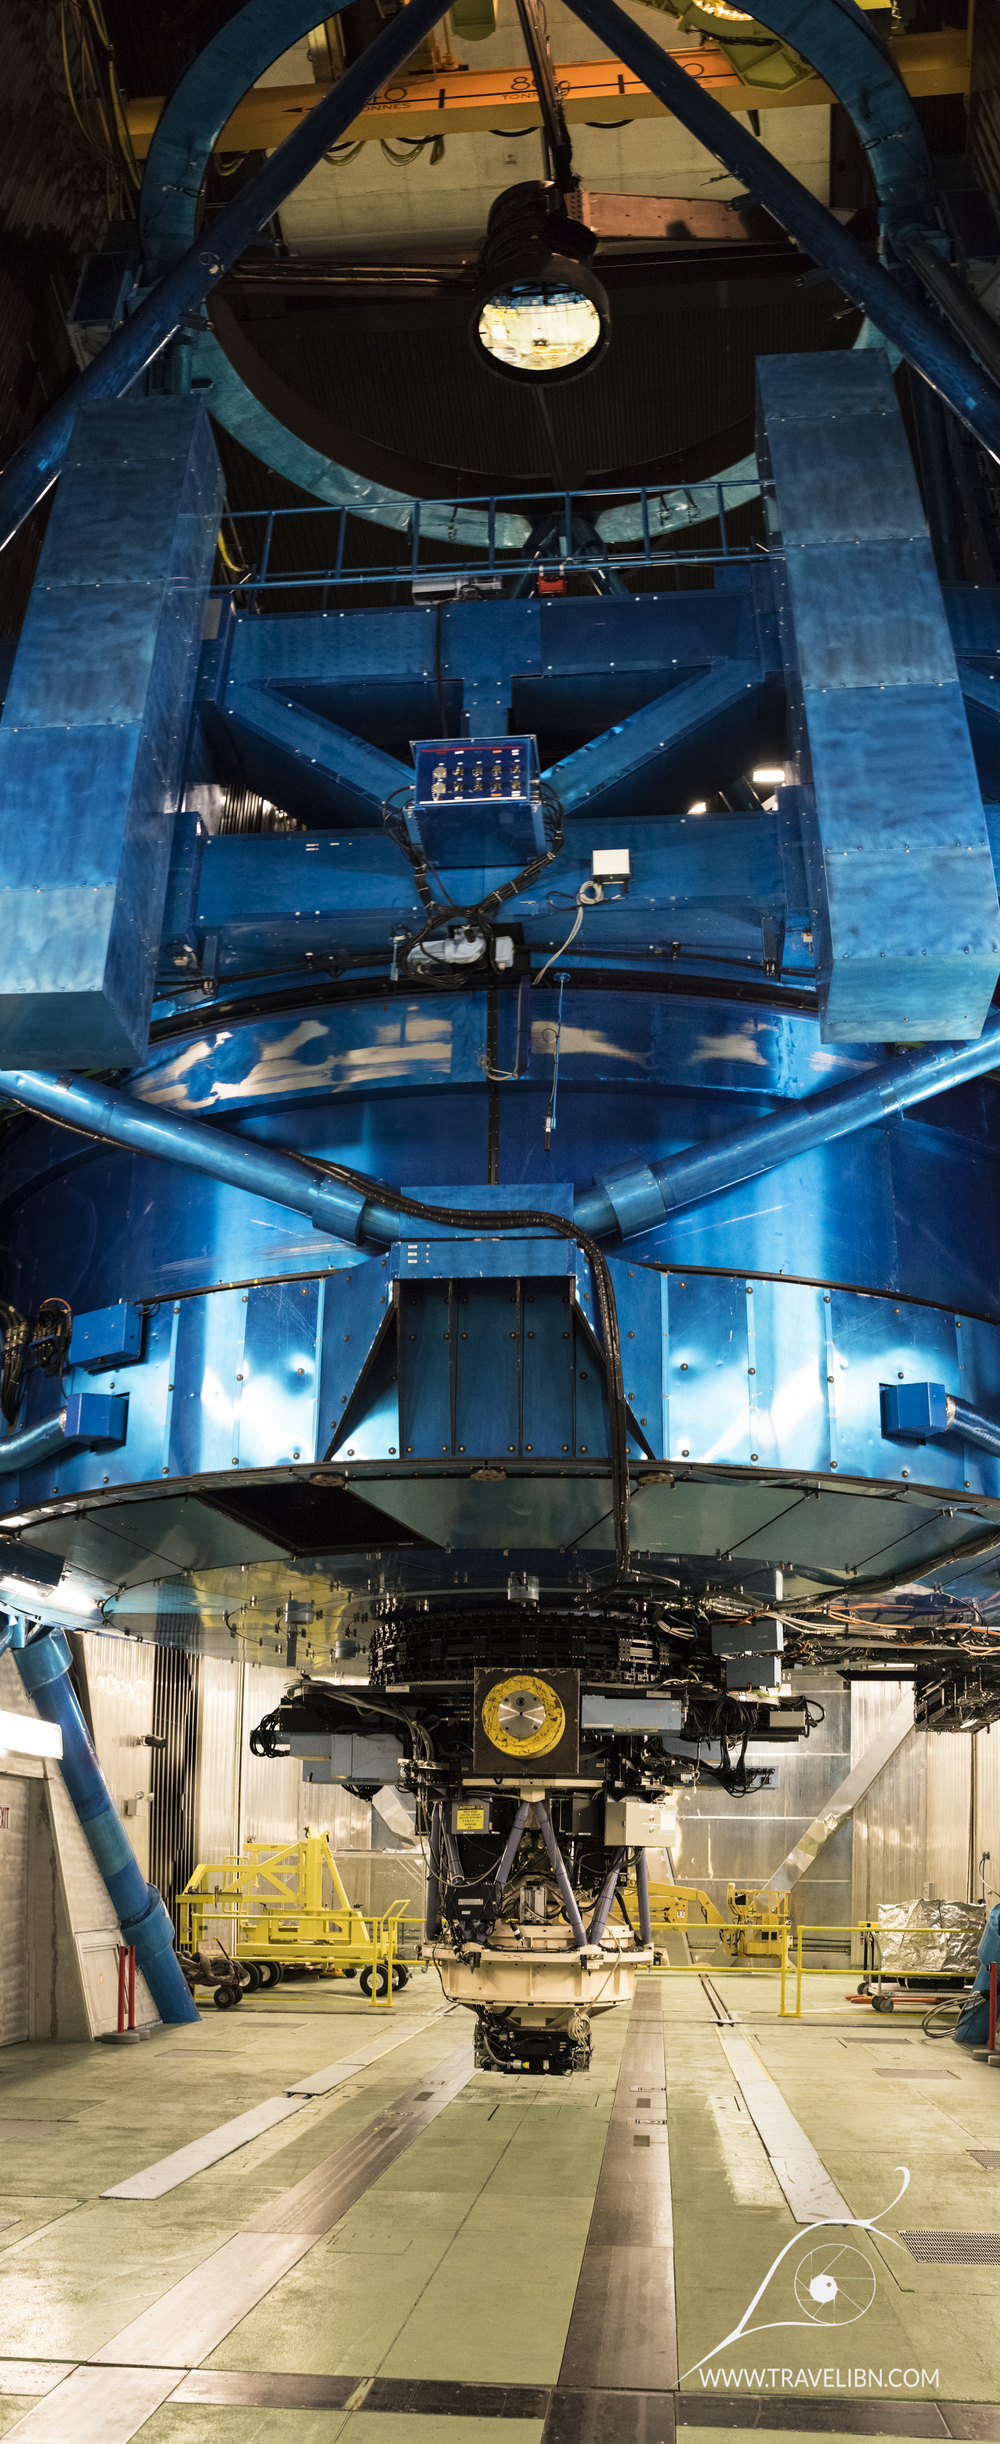 Subaru telescope structure